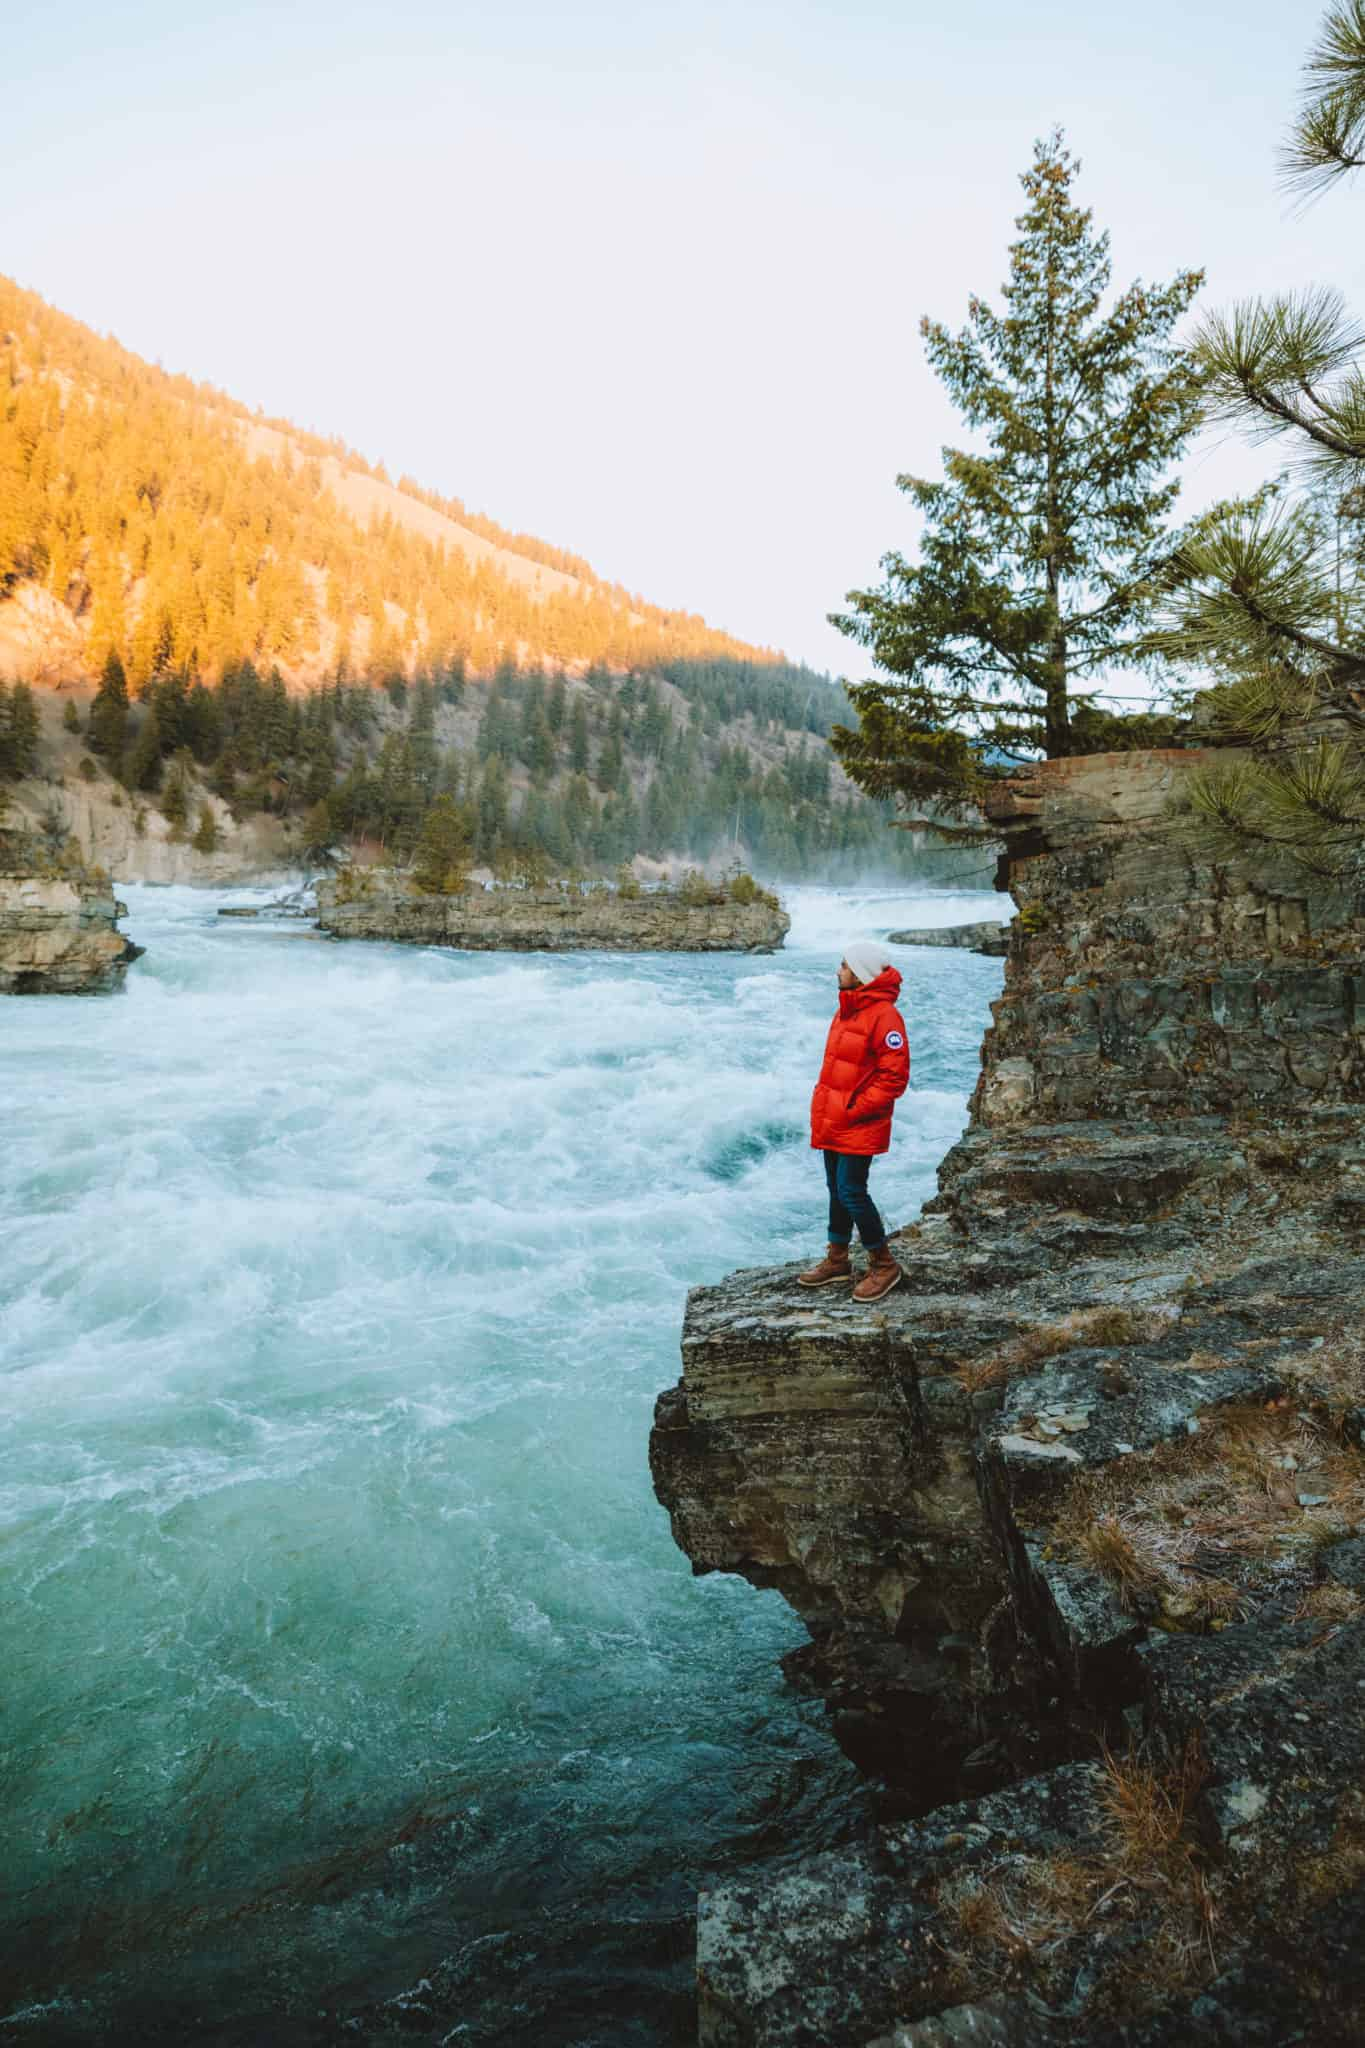 Berty Mandagie standing next to Kootenai Falls, Libby Montana - TheMandagies.com